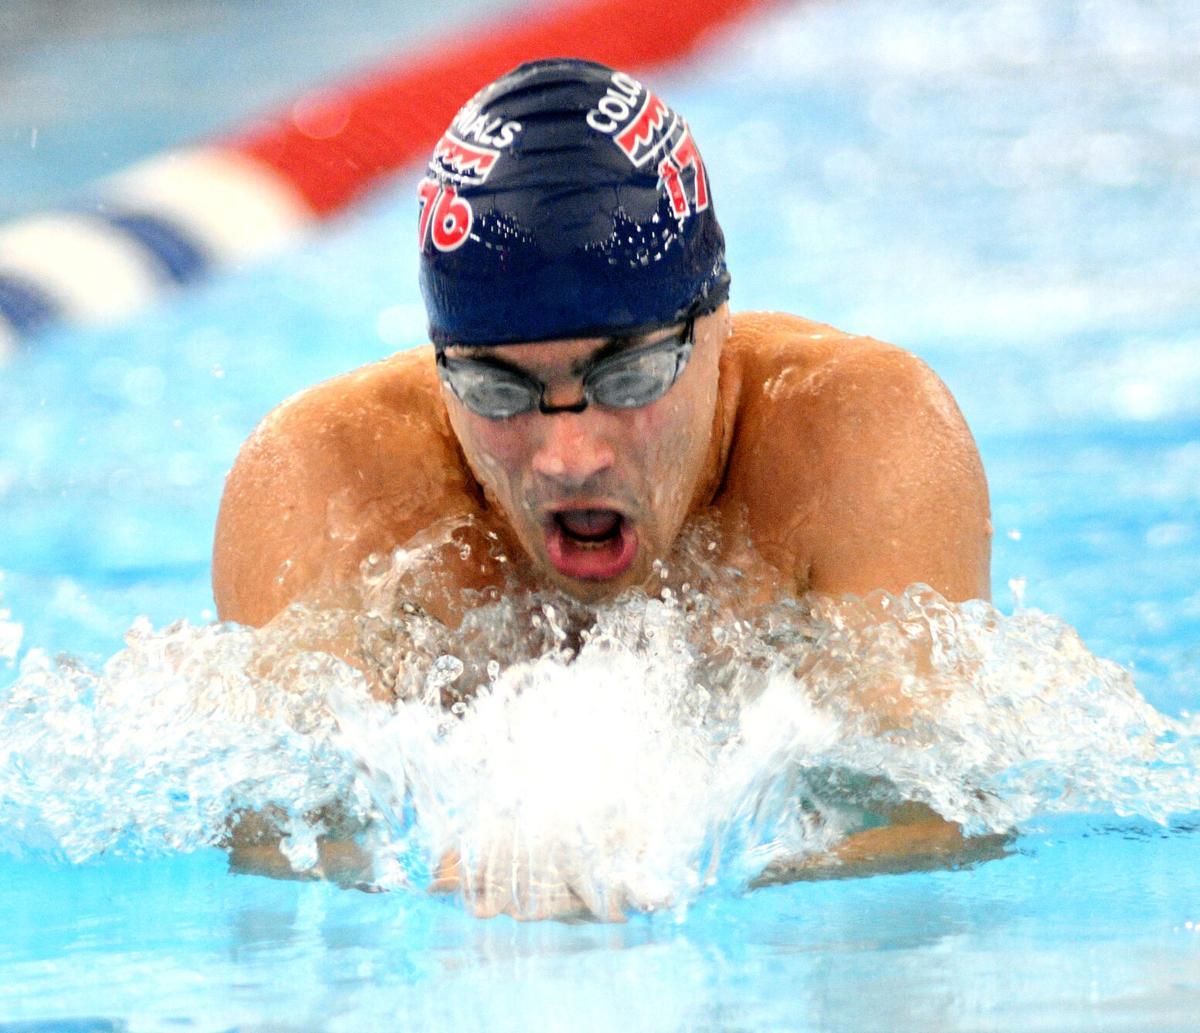 1010 masters swimming 5